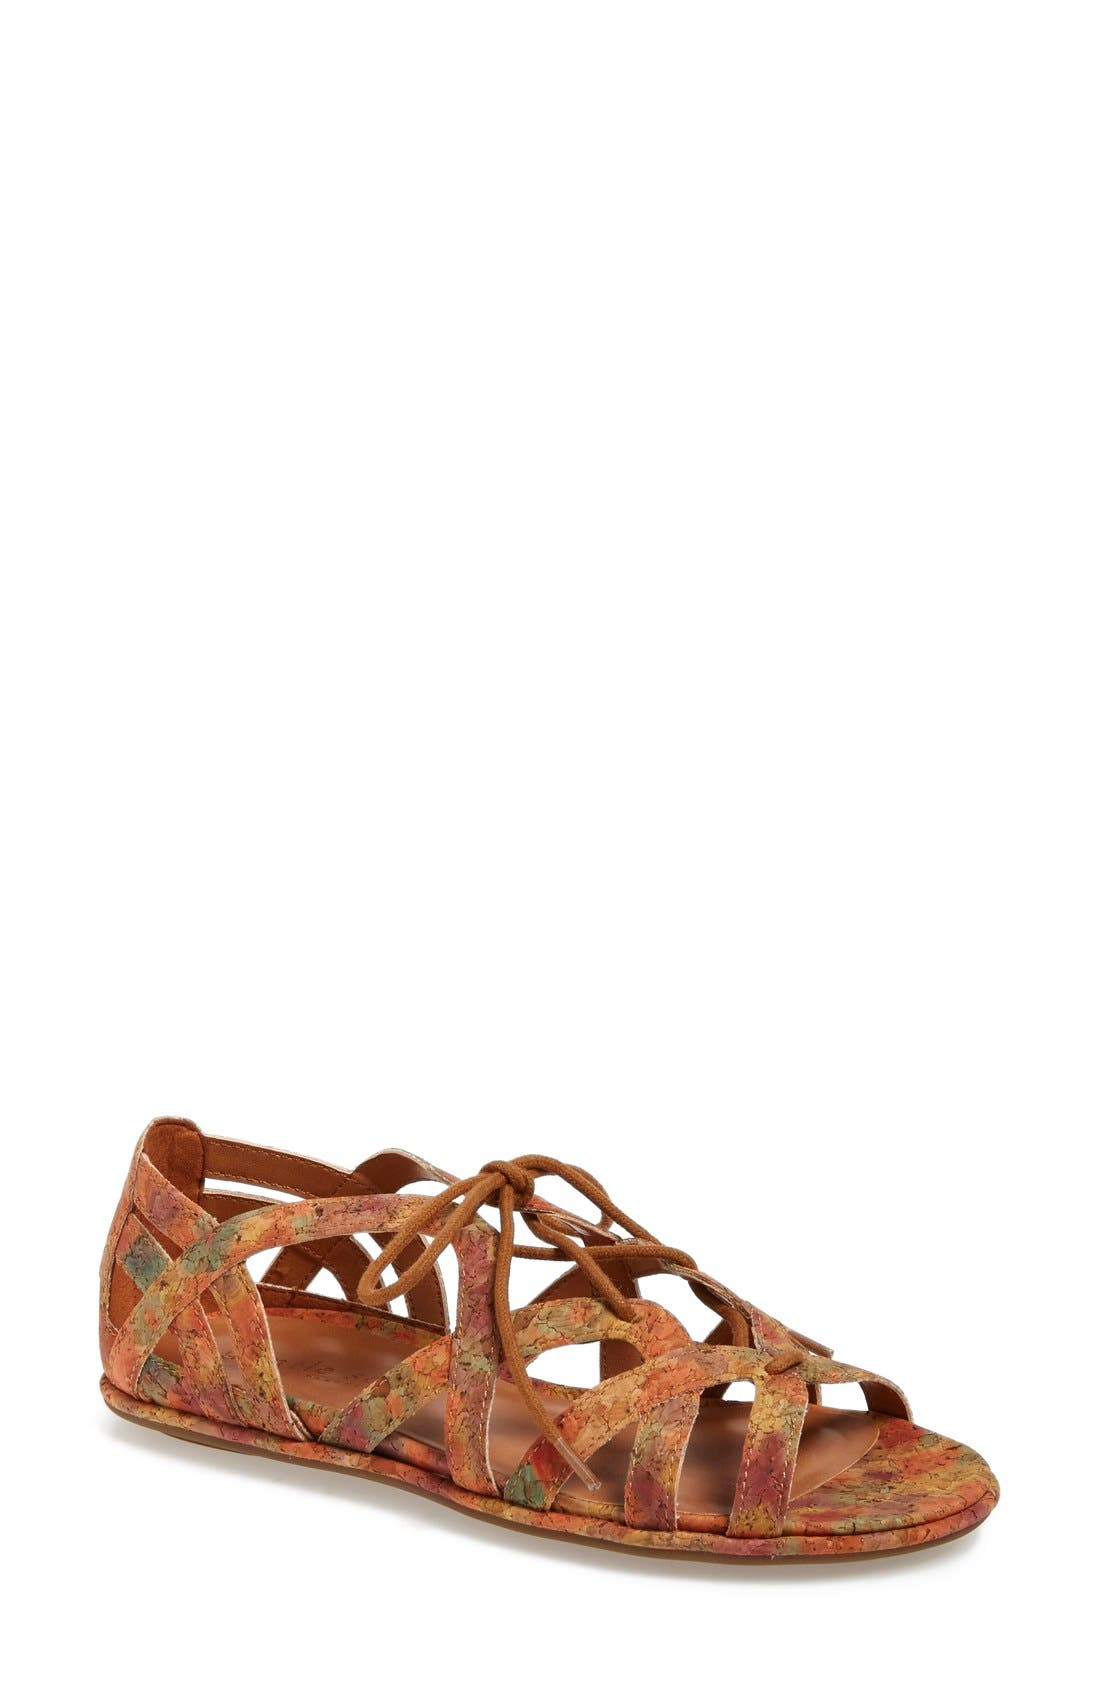 'Orly' Lace-Up Sandal,                             Main thumbnail 1, color,                             Natural/ Floral Cork